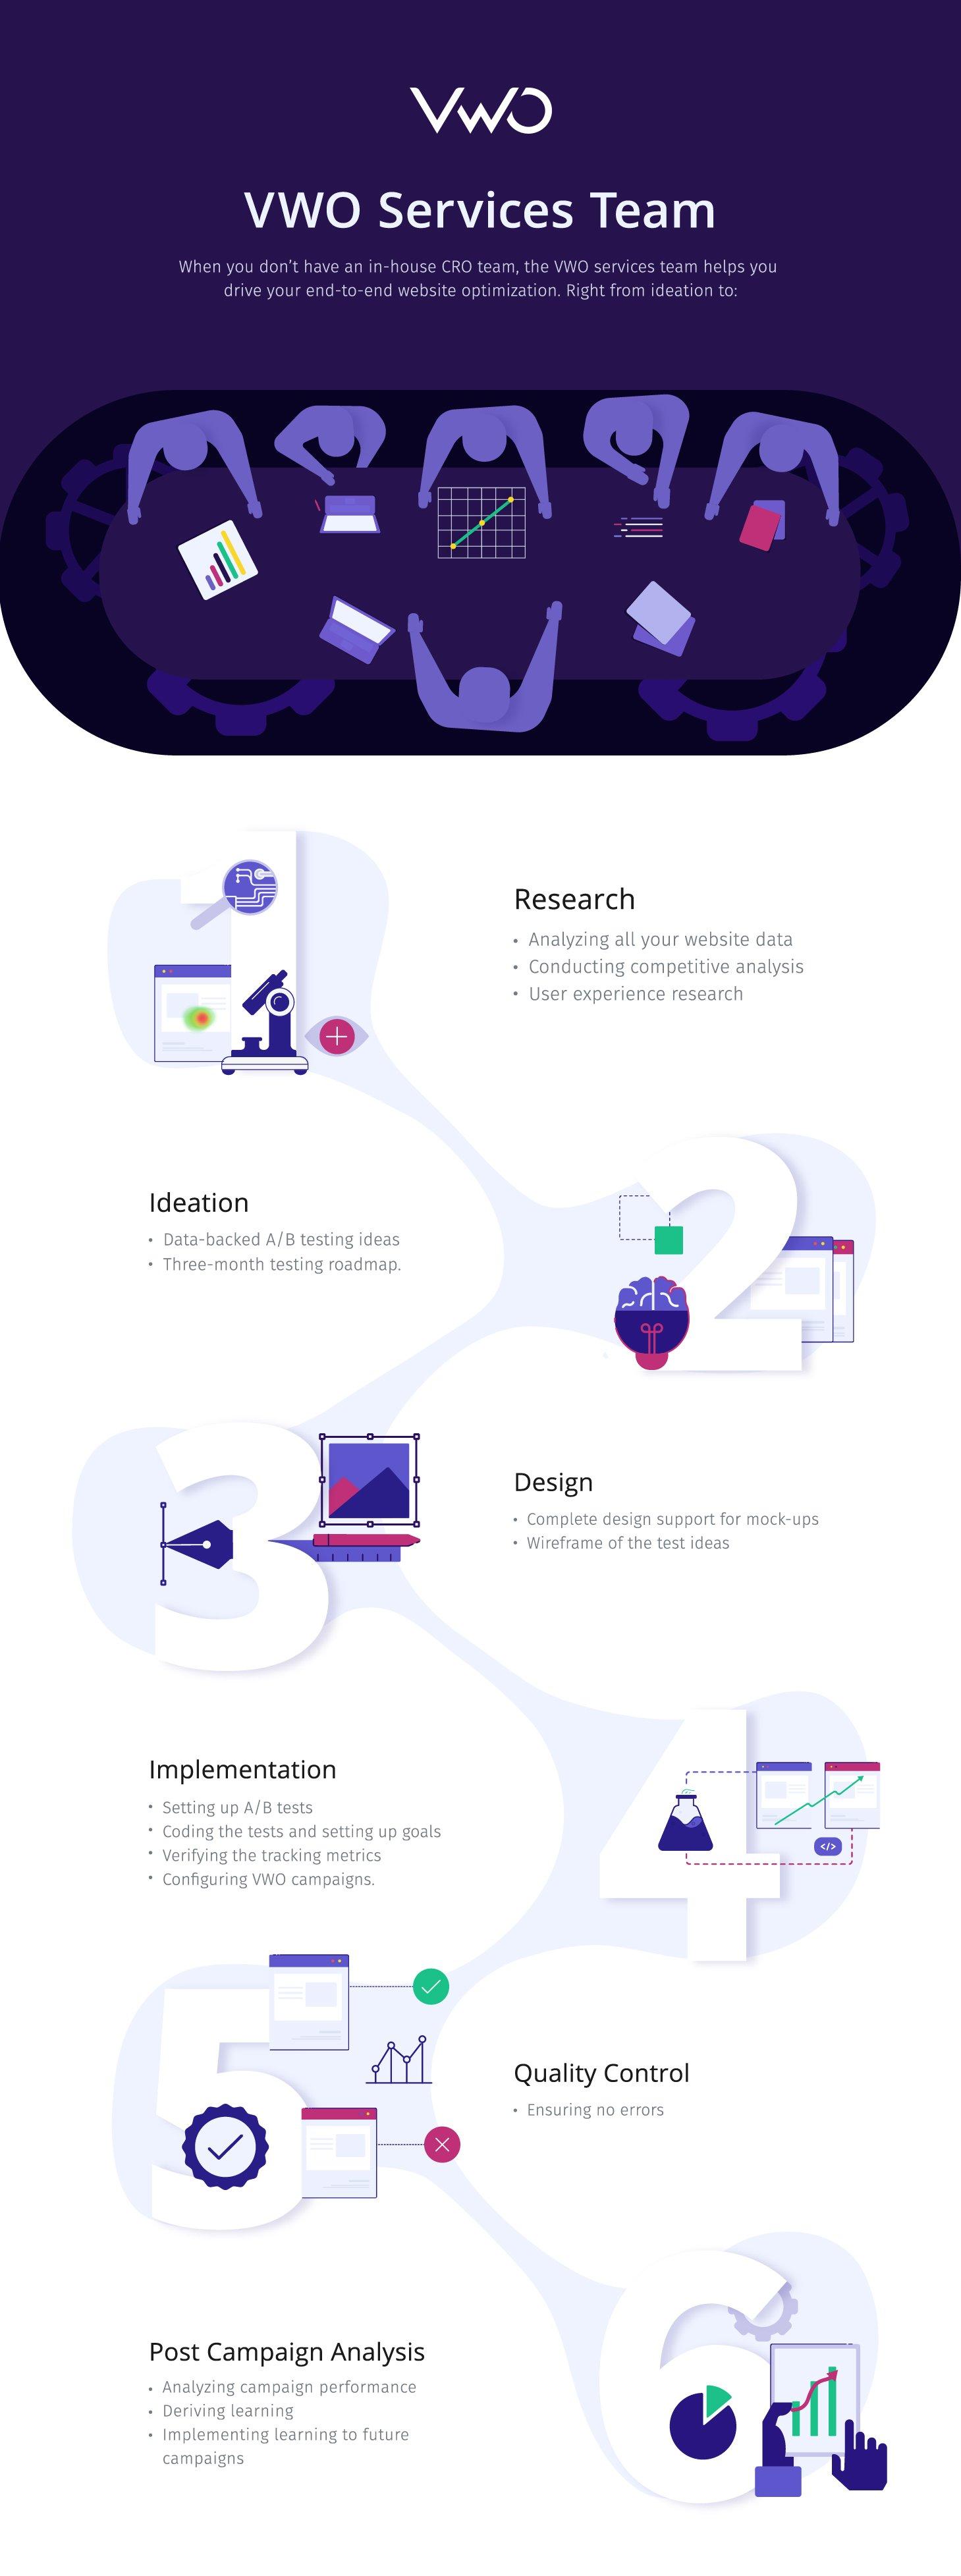 Vwo Services Team Infographic